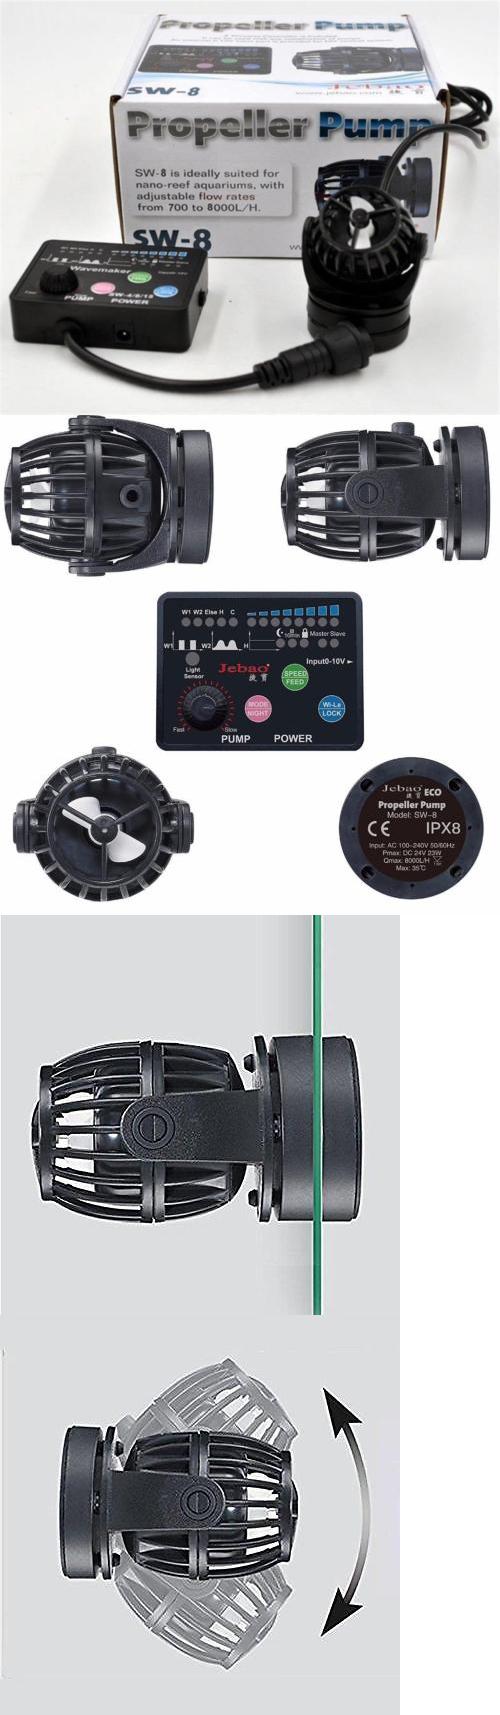 Pumps Water 77641: Jebao / Jecod Sw8 Wireless Wavemaker Aquarium Pump Controller 2017 Model Pp8 Rw8 BUY IT NOW ONLY: $59.95